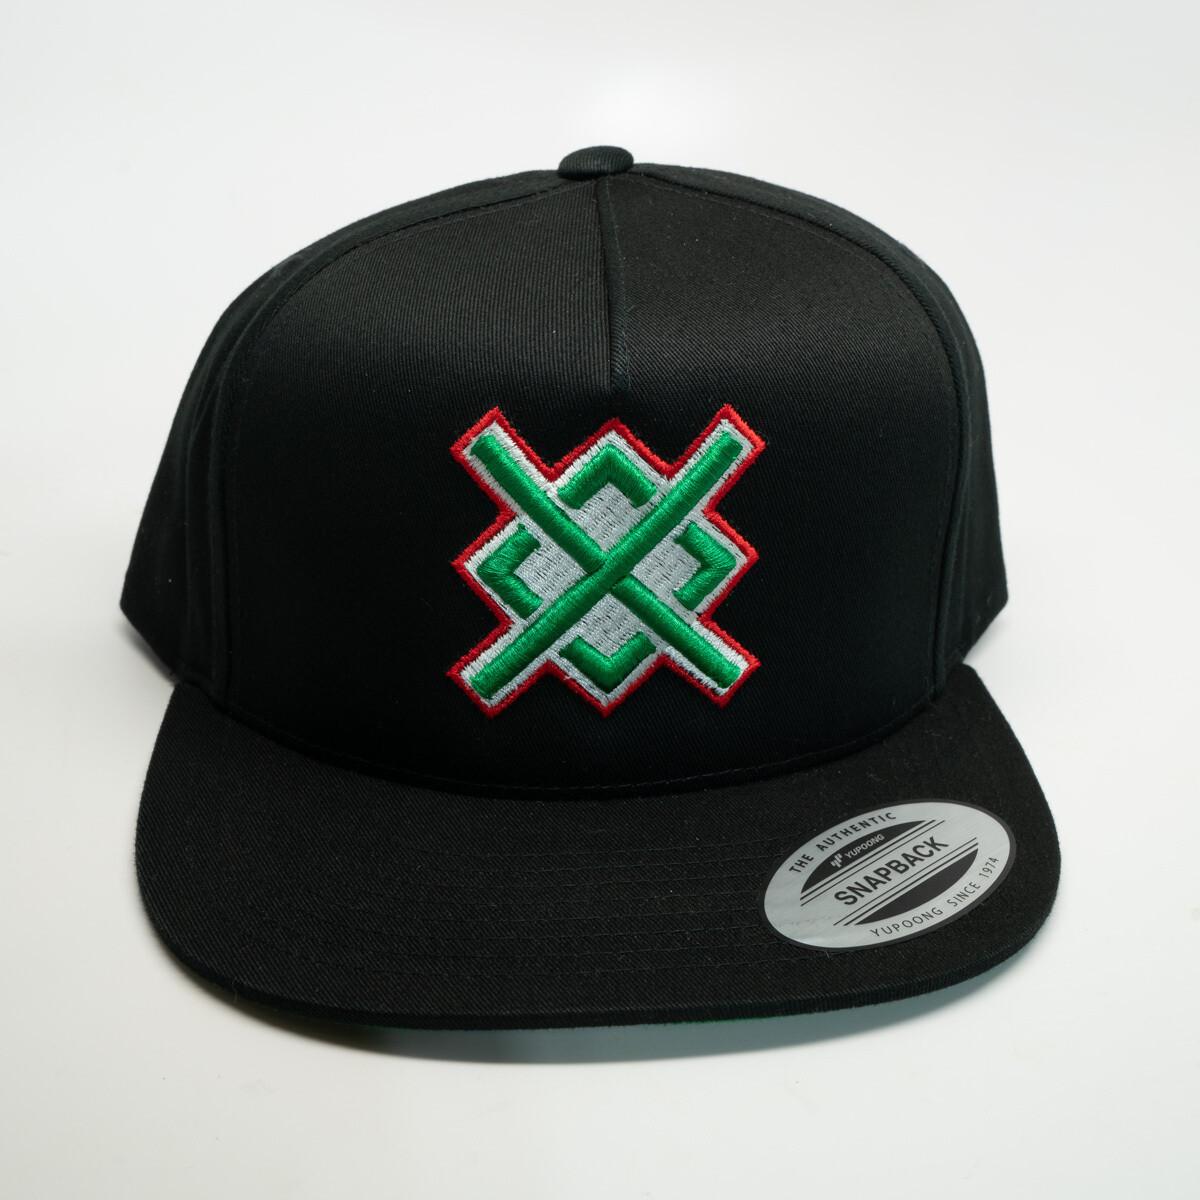 Nardcore Snapback Hat - Chicano